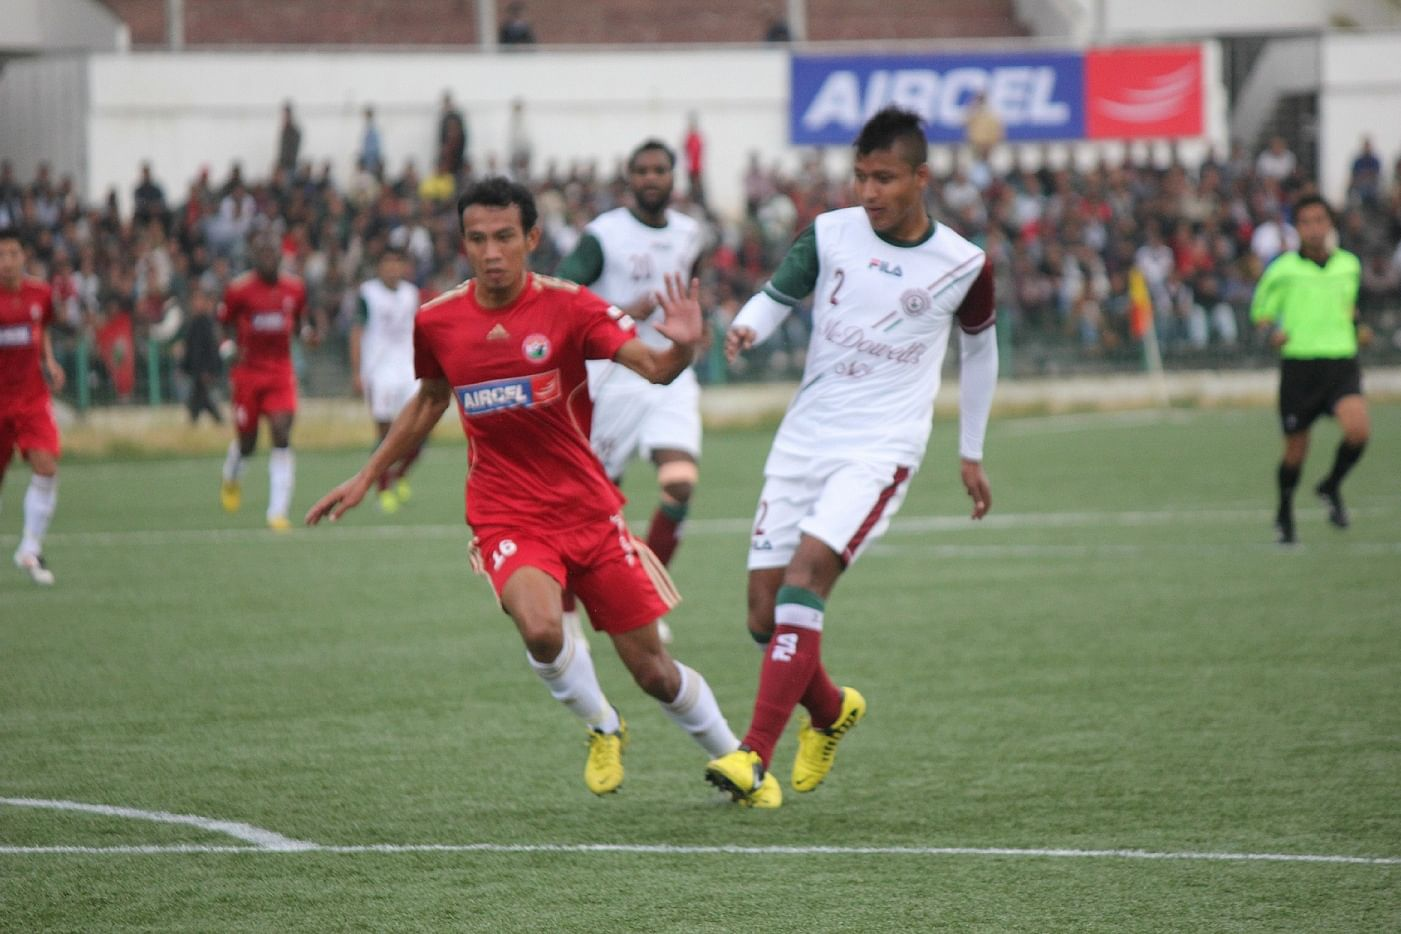 Aibor Khongjee (in white) Photo Credit: Shillong Lajong FC